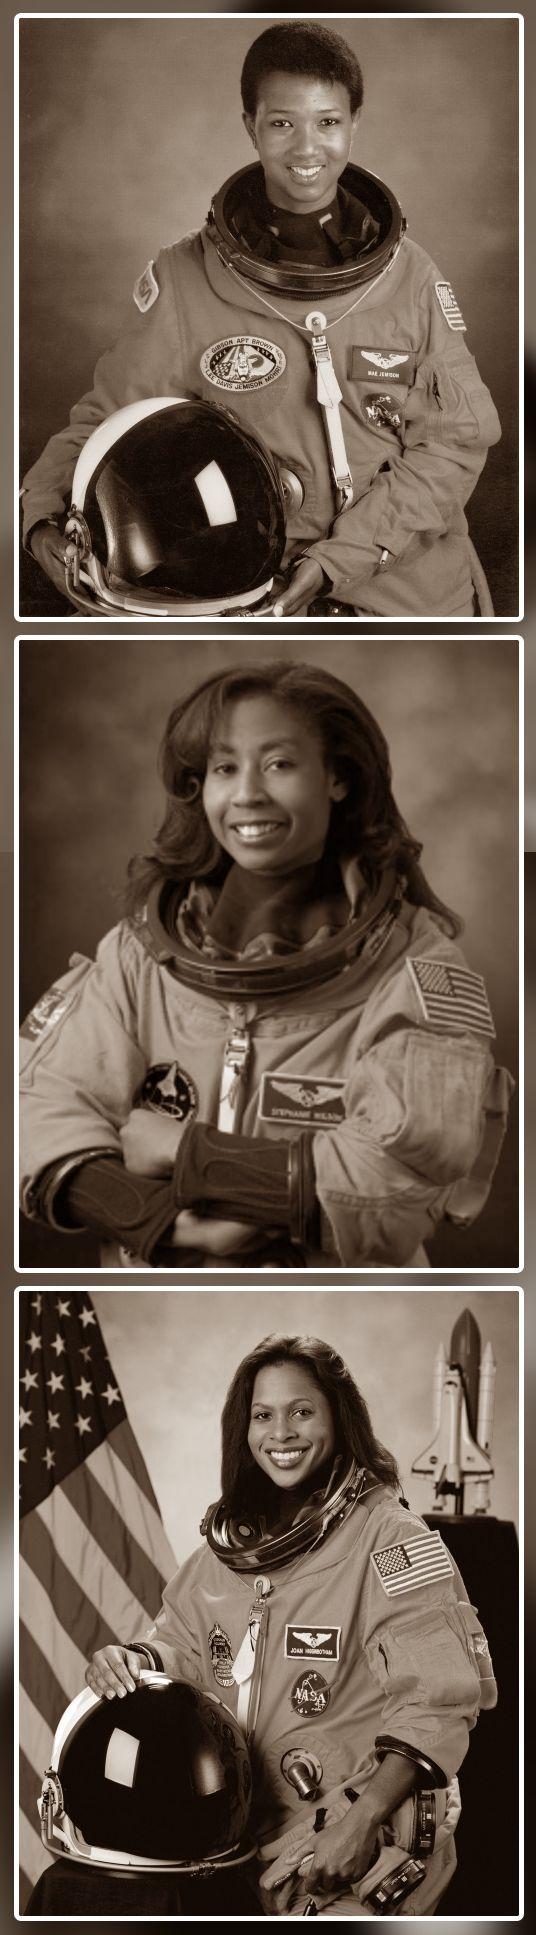 77 best astronauts images on Pinterest | Astronauts ...